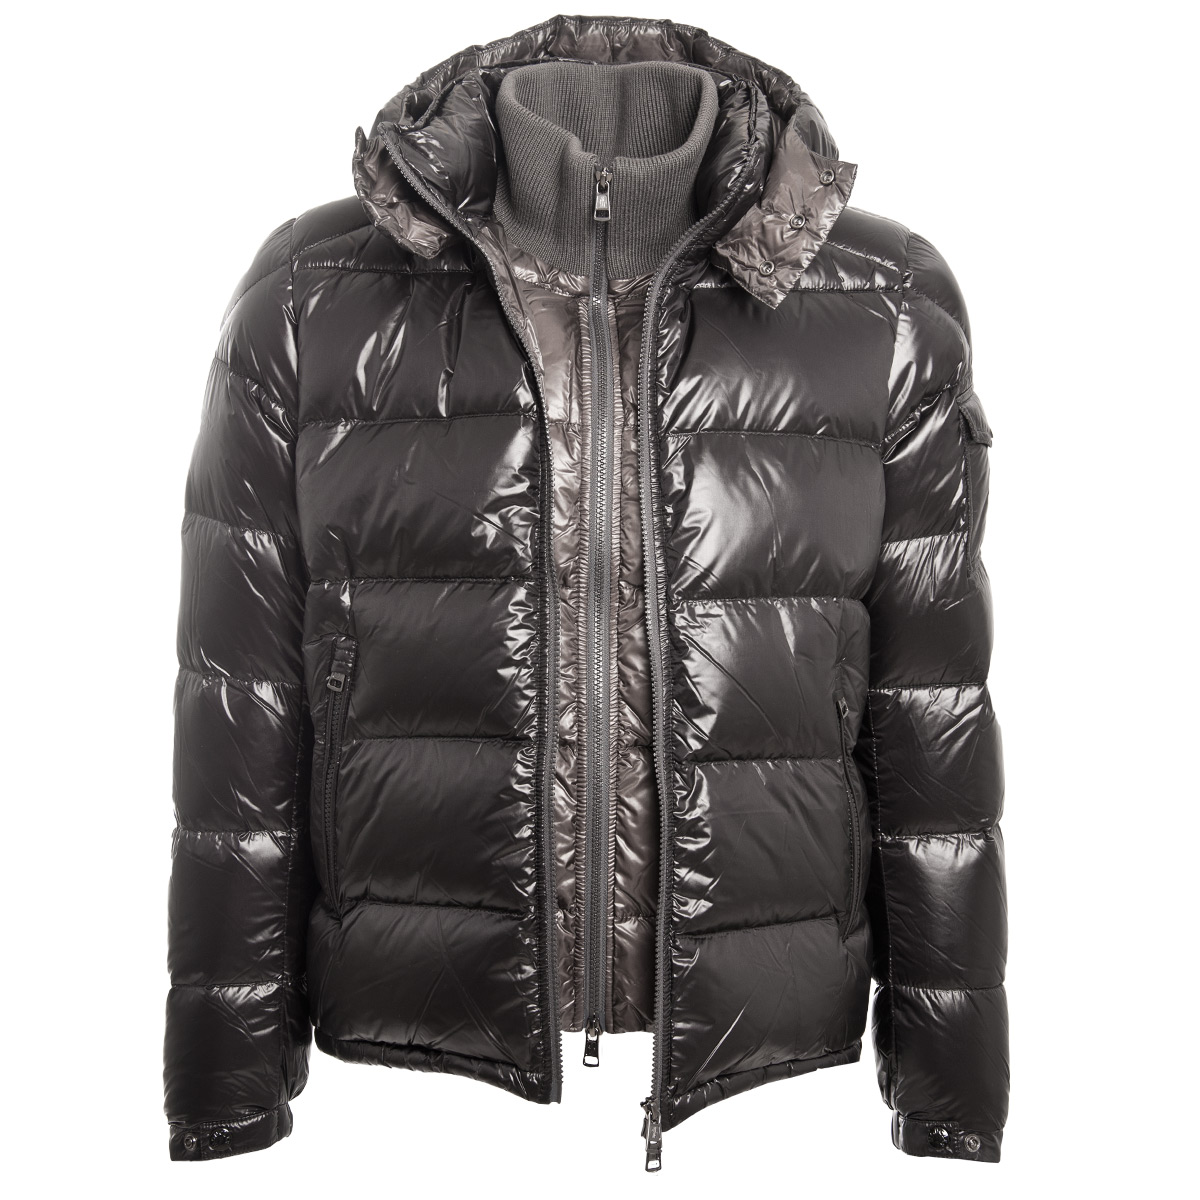 moncler zin jacket review